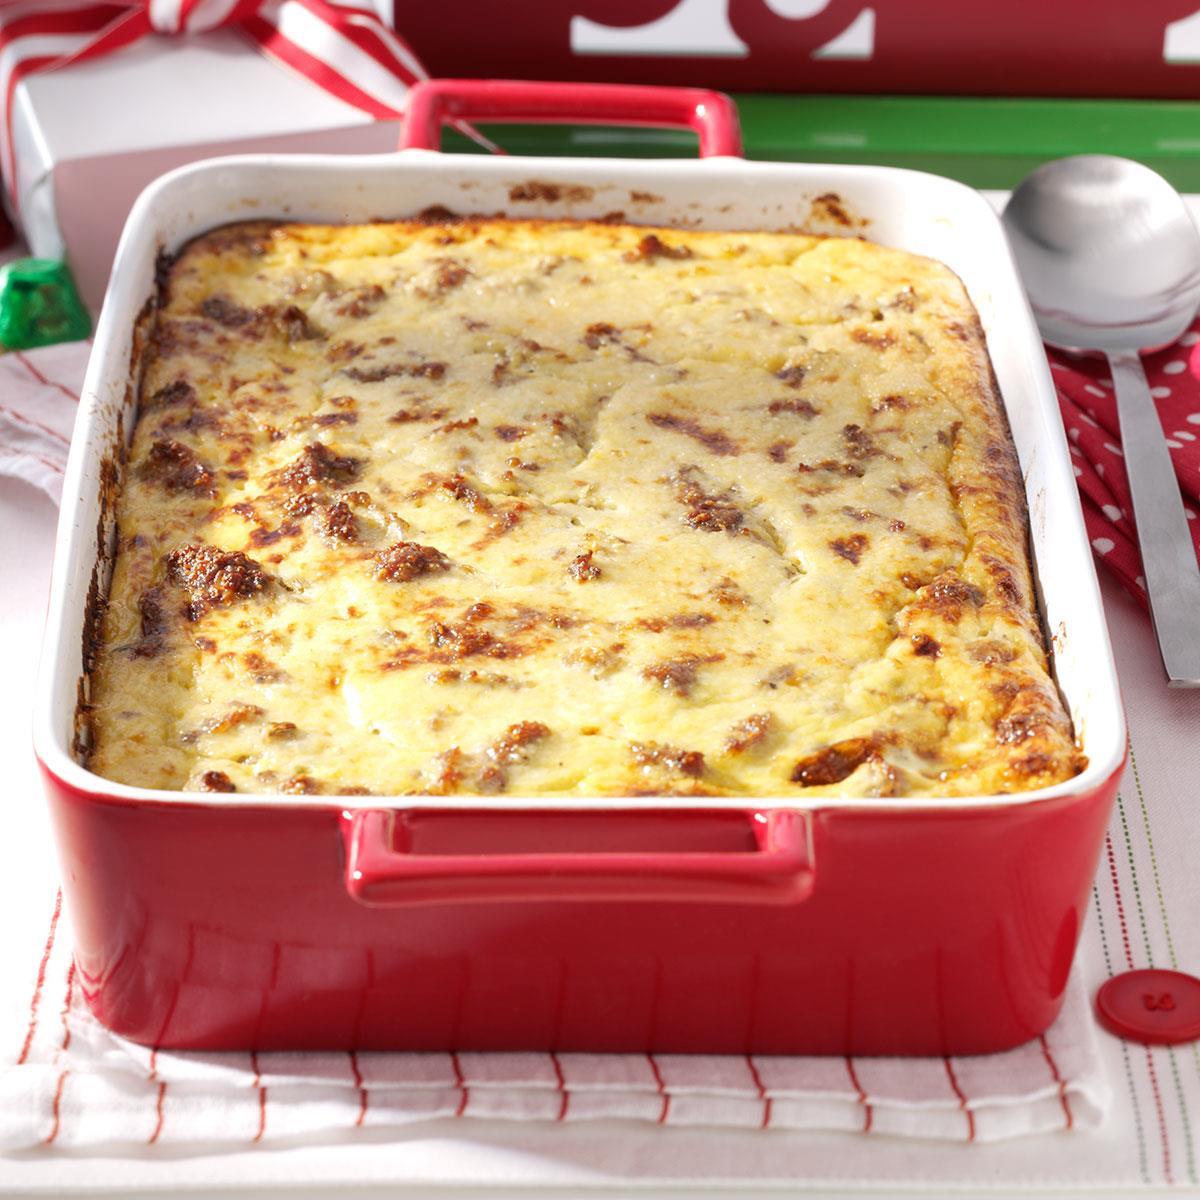 Cheese Grits & Sausage Breakfast Casserole Recipe